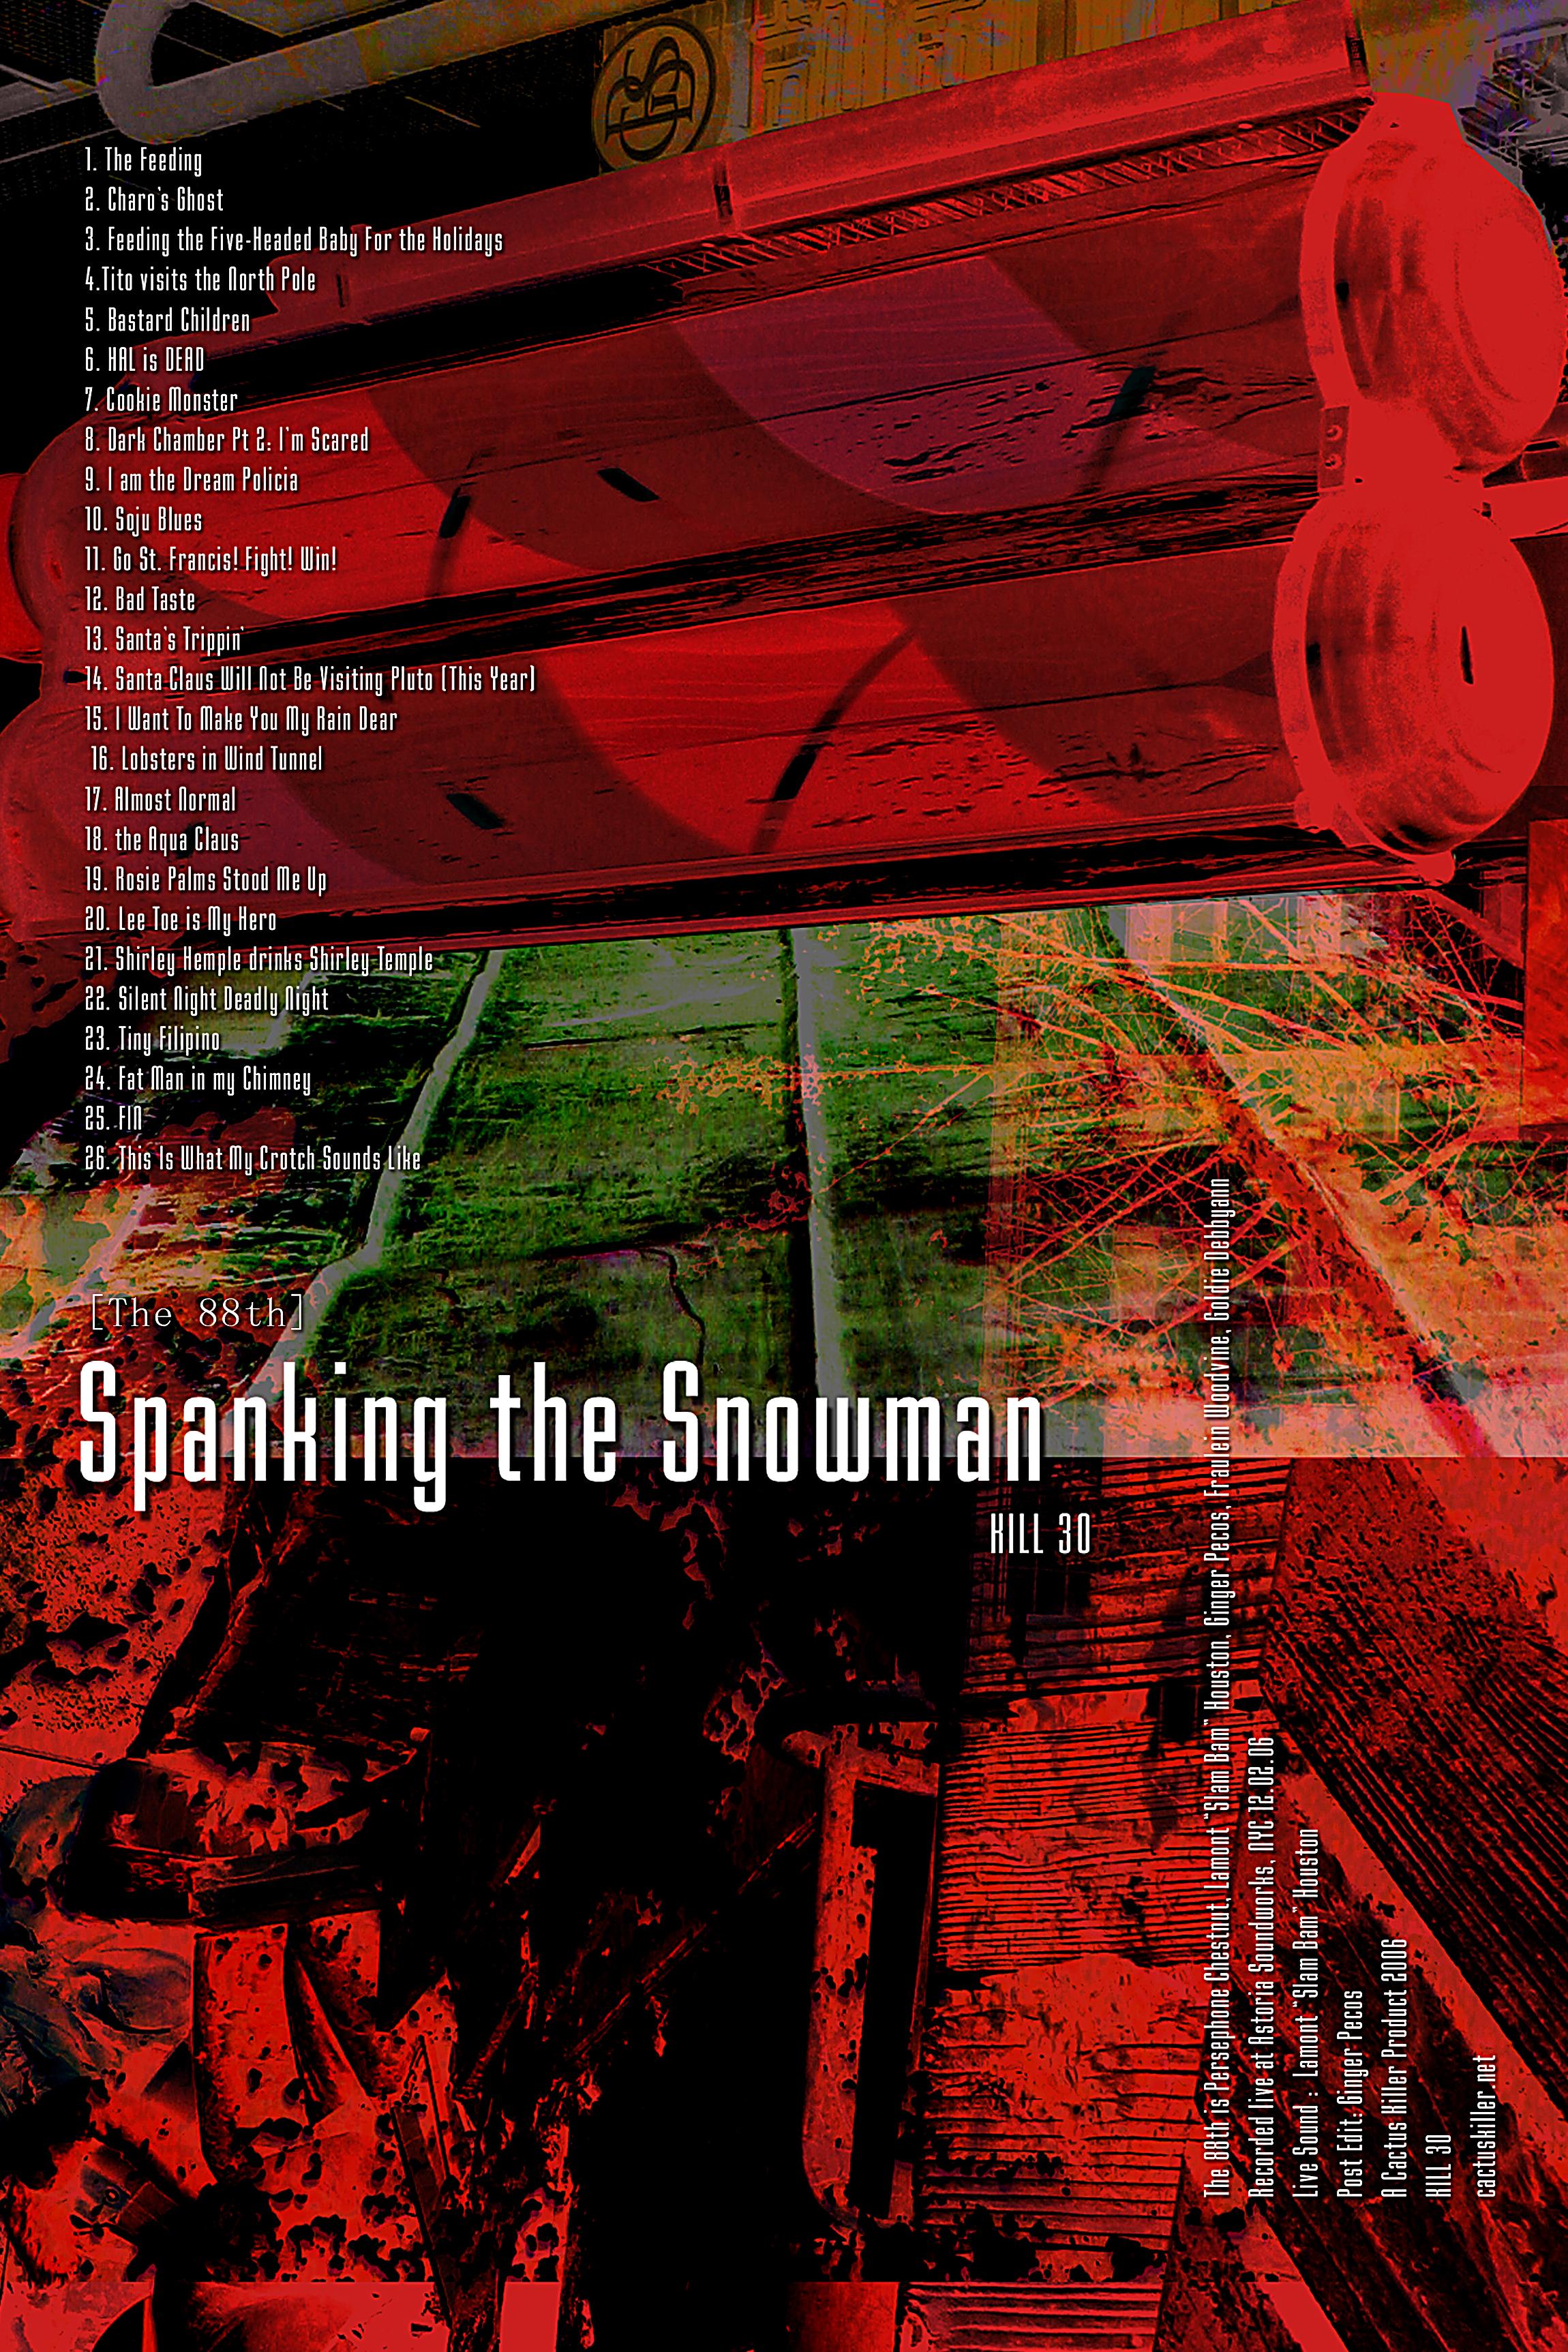 """Spanking the Snowman"""